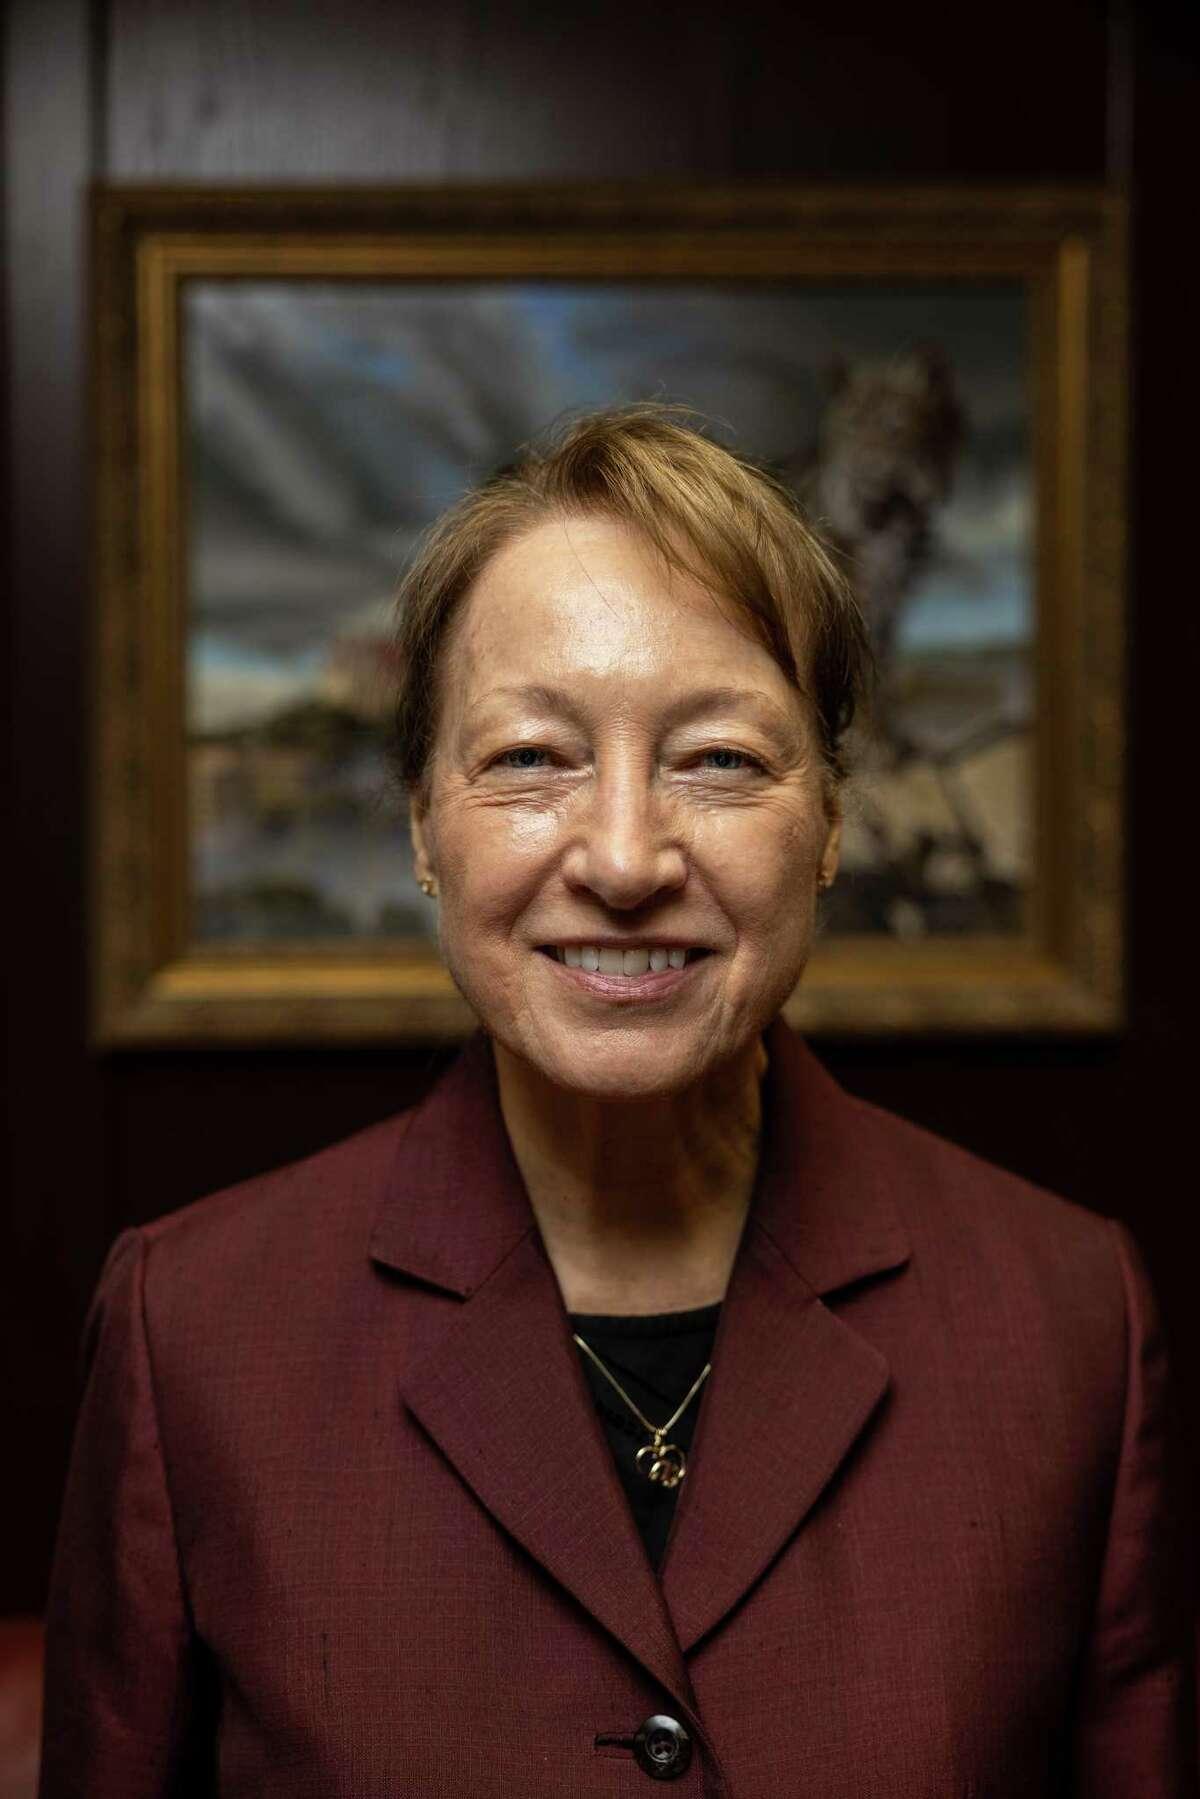 Texas State University President Denise Trauth retires next year.